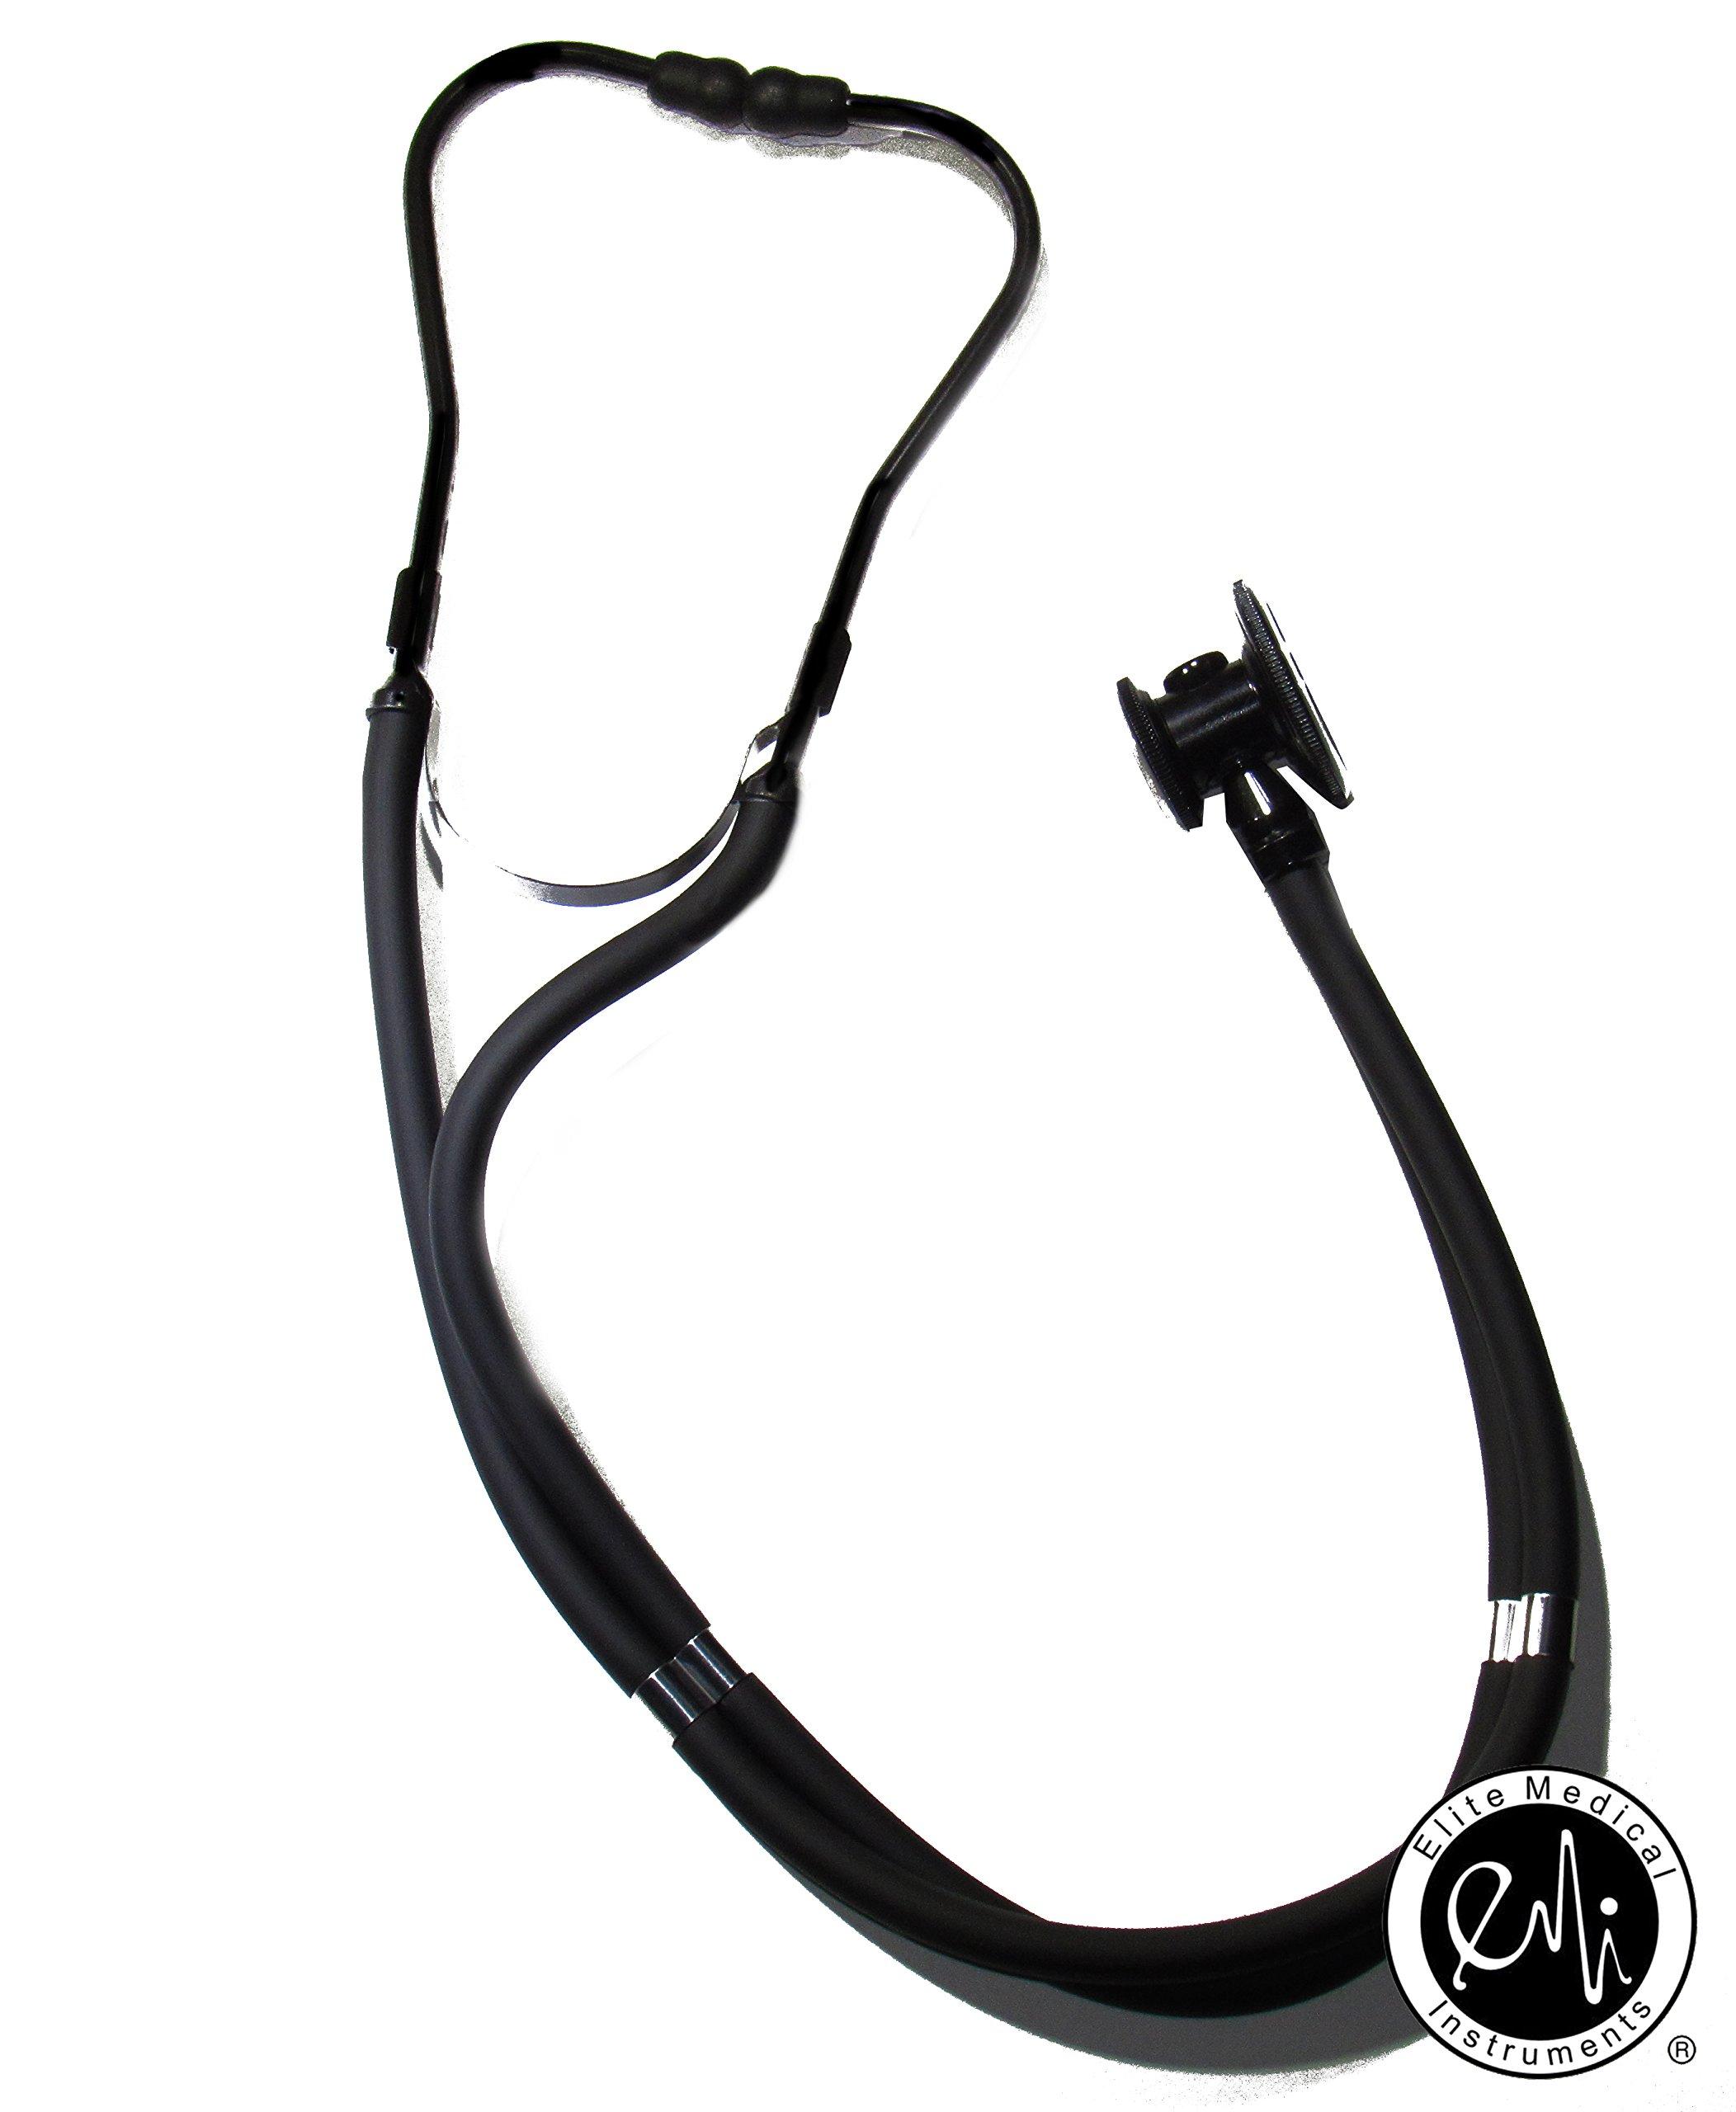 EMI Sprague Rappaport Dual Head Stethoscope - STEALTH BLACK - 112SB